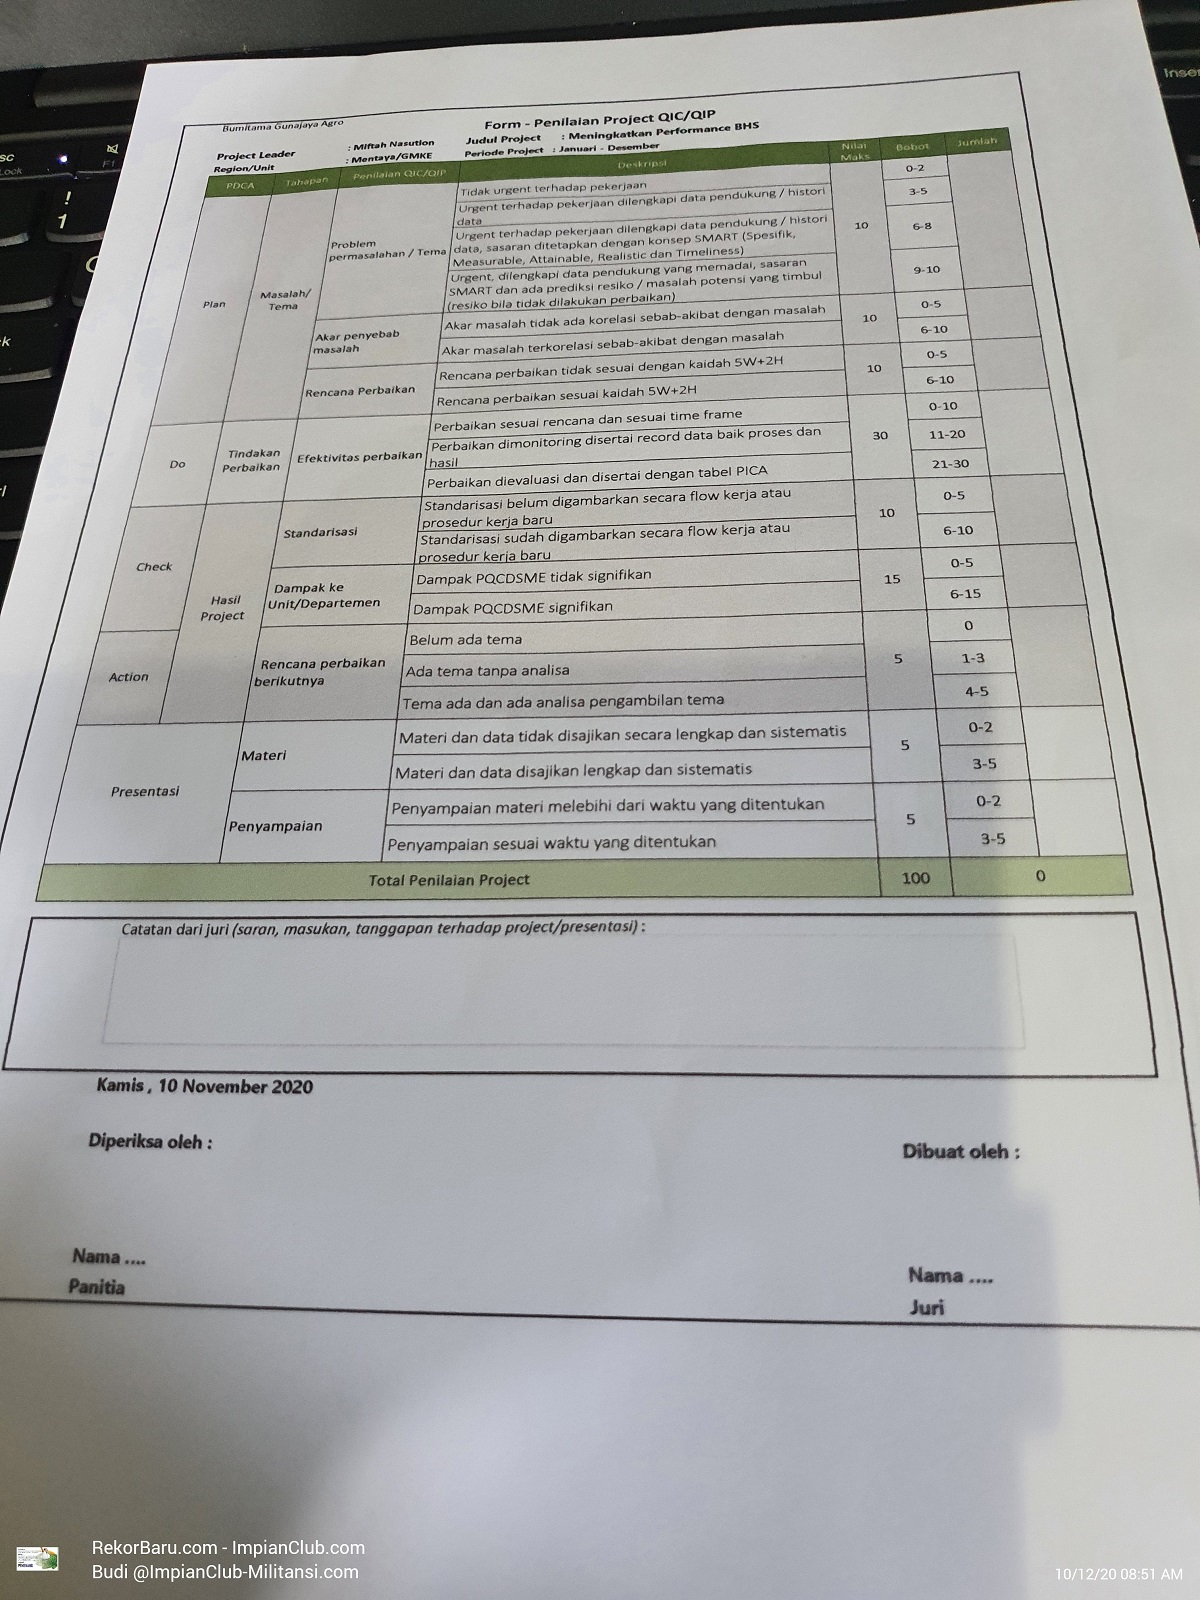 Form Penilaian Project QIC atau QIP